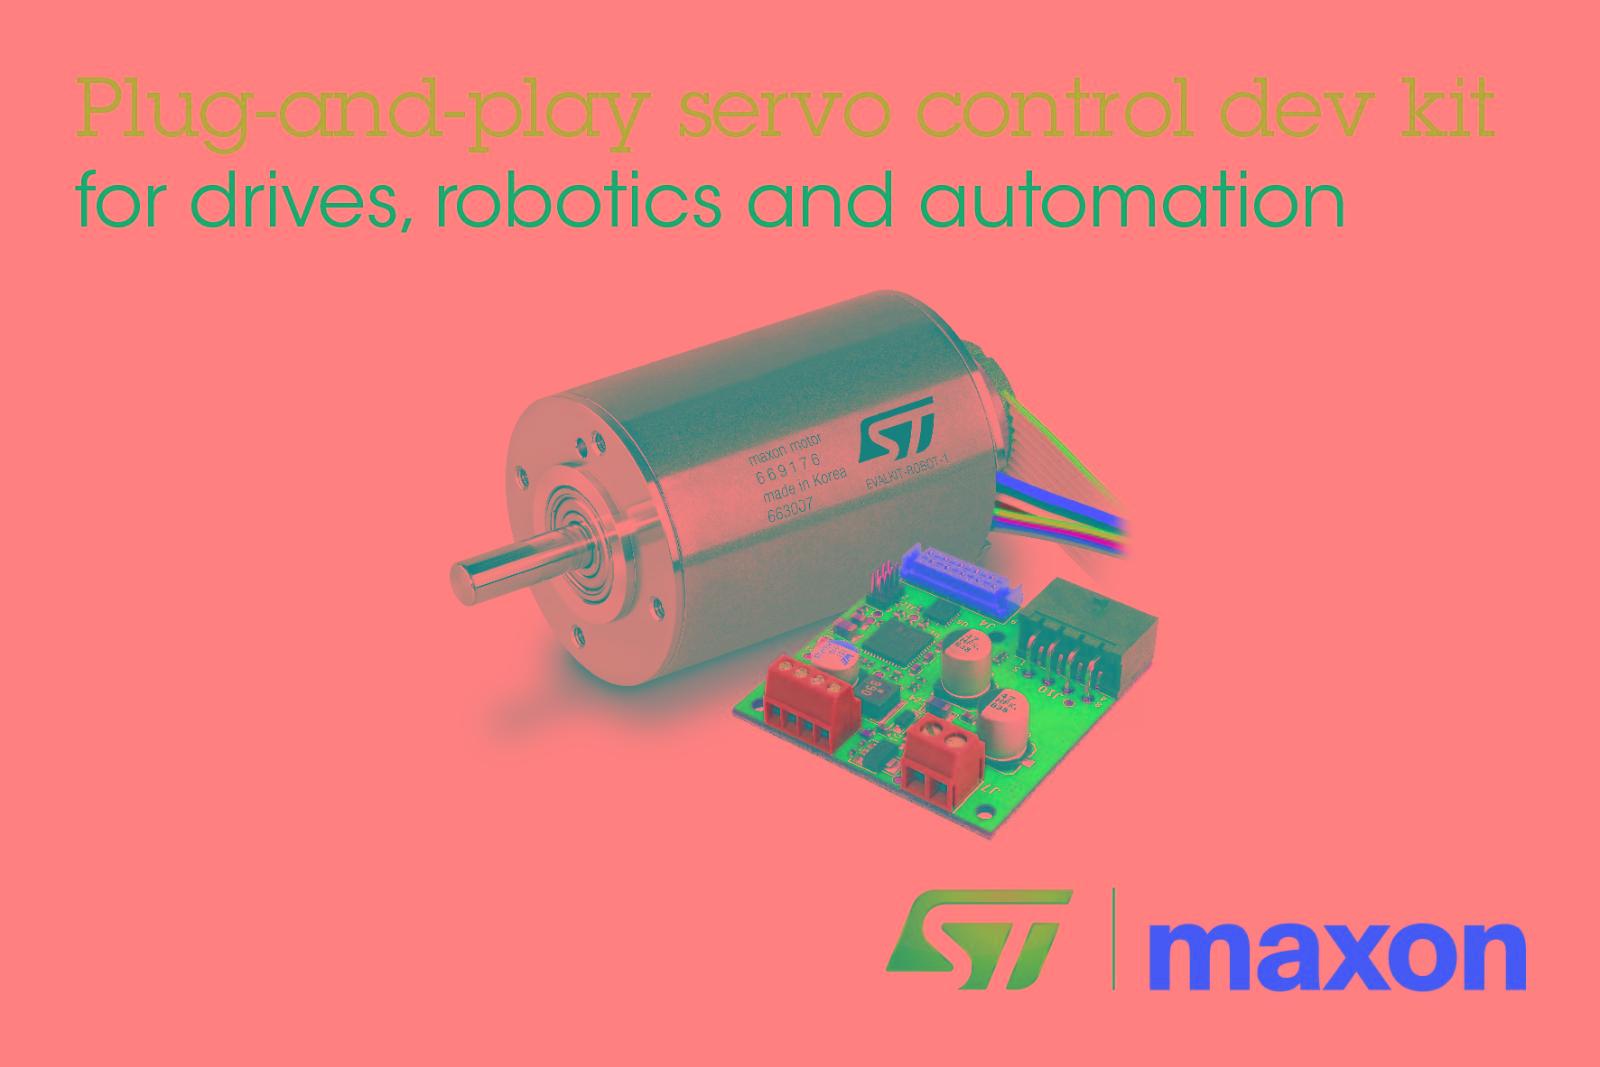 ST新闻稿2019年11月26日——意法半导体与maxon合作开发机器人及自动化精密电机控制解决方案.jpg